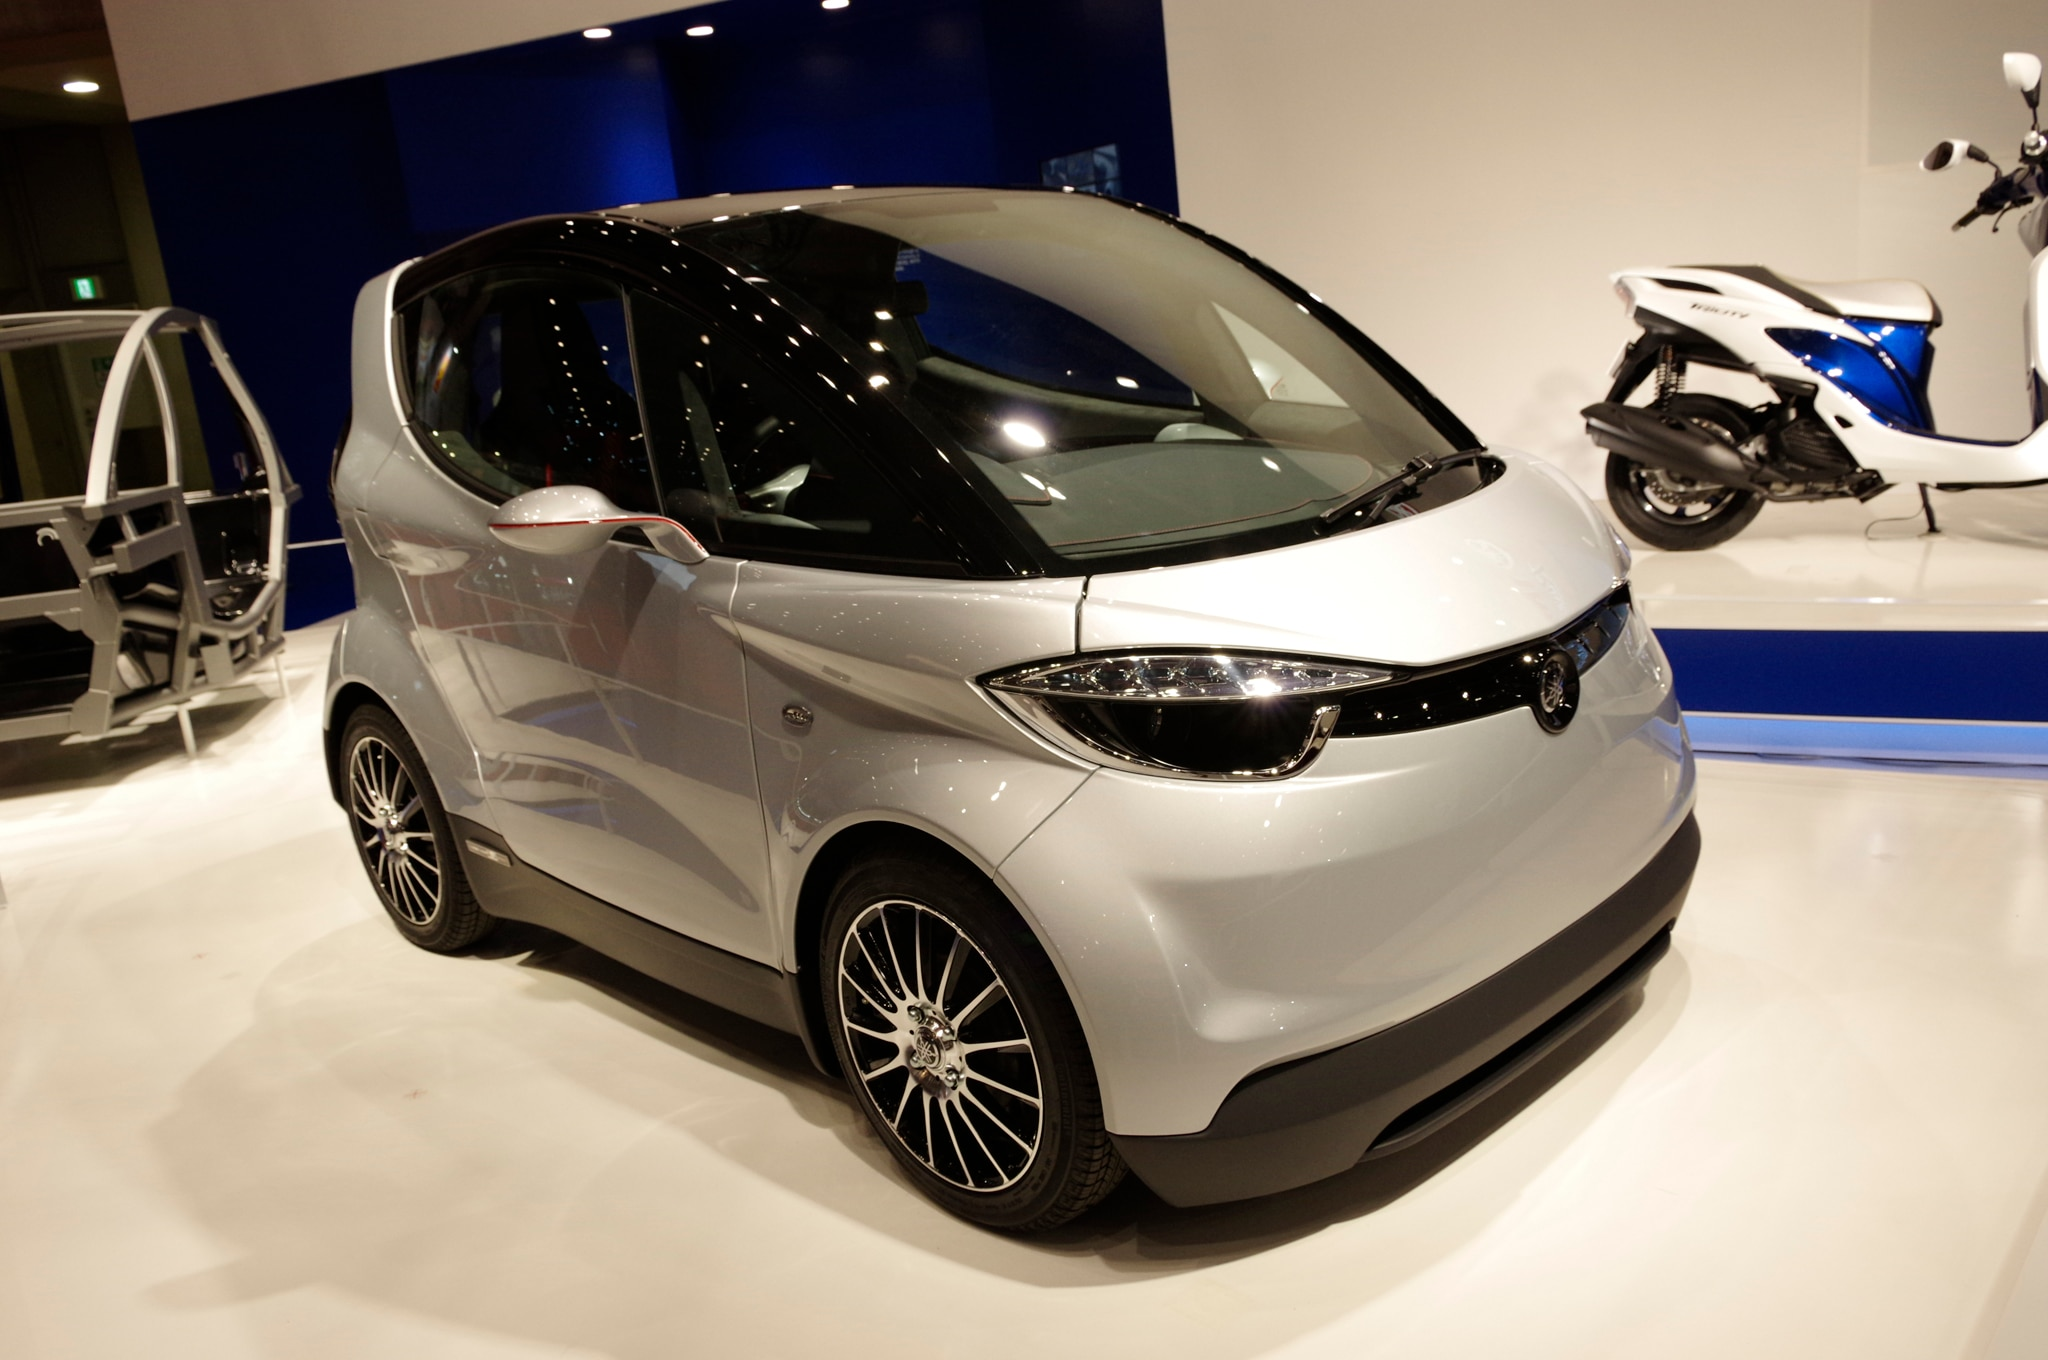 Yamaha Teases Sports Car Concept For Tokyo Auto Show